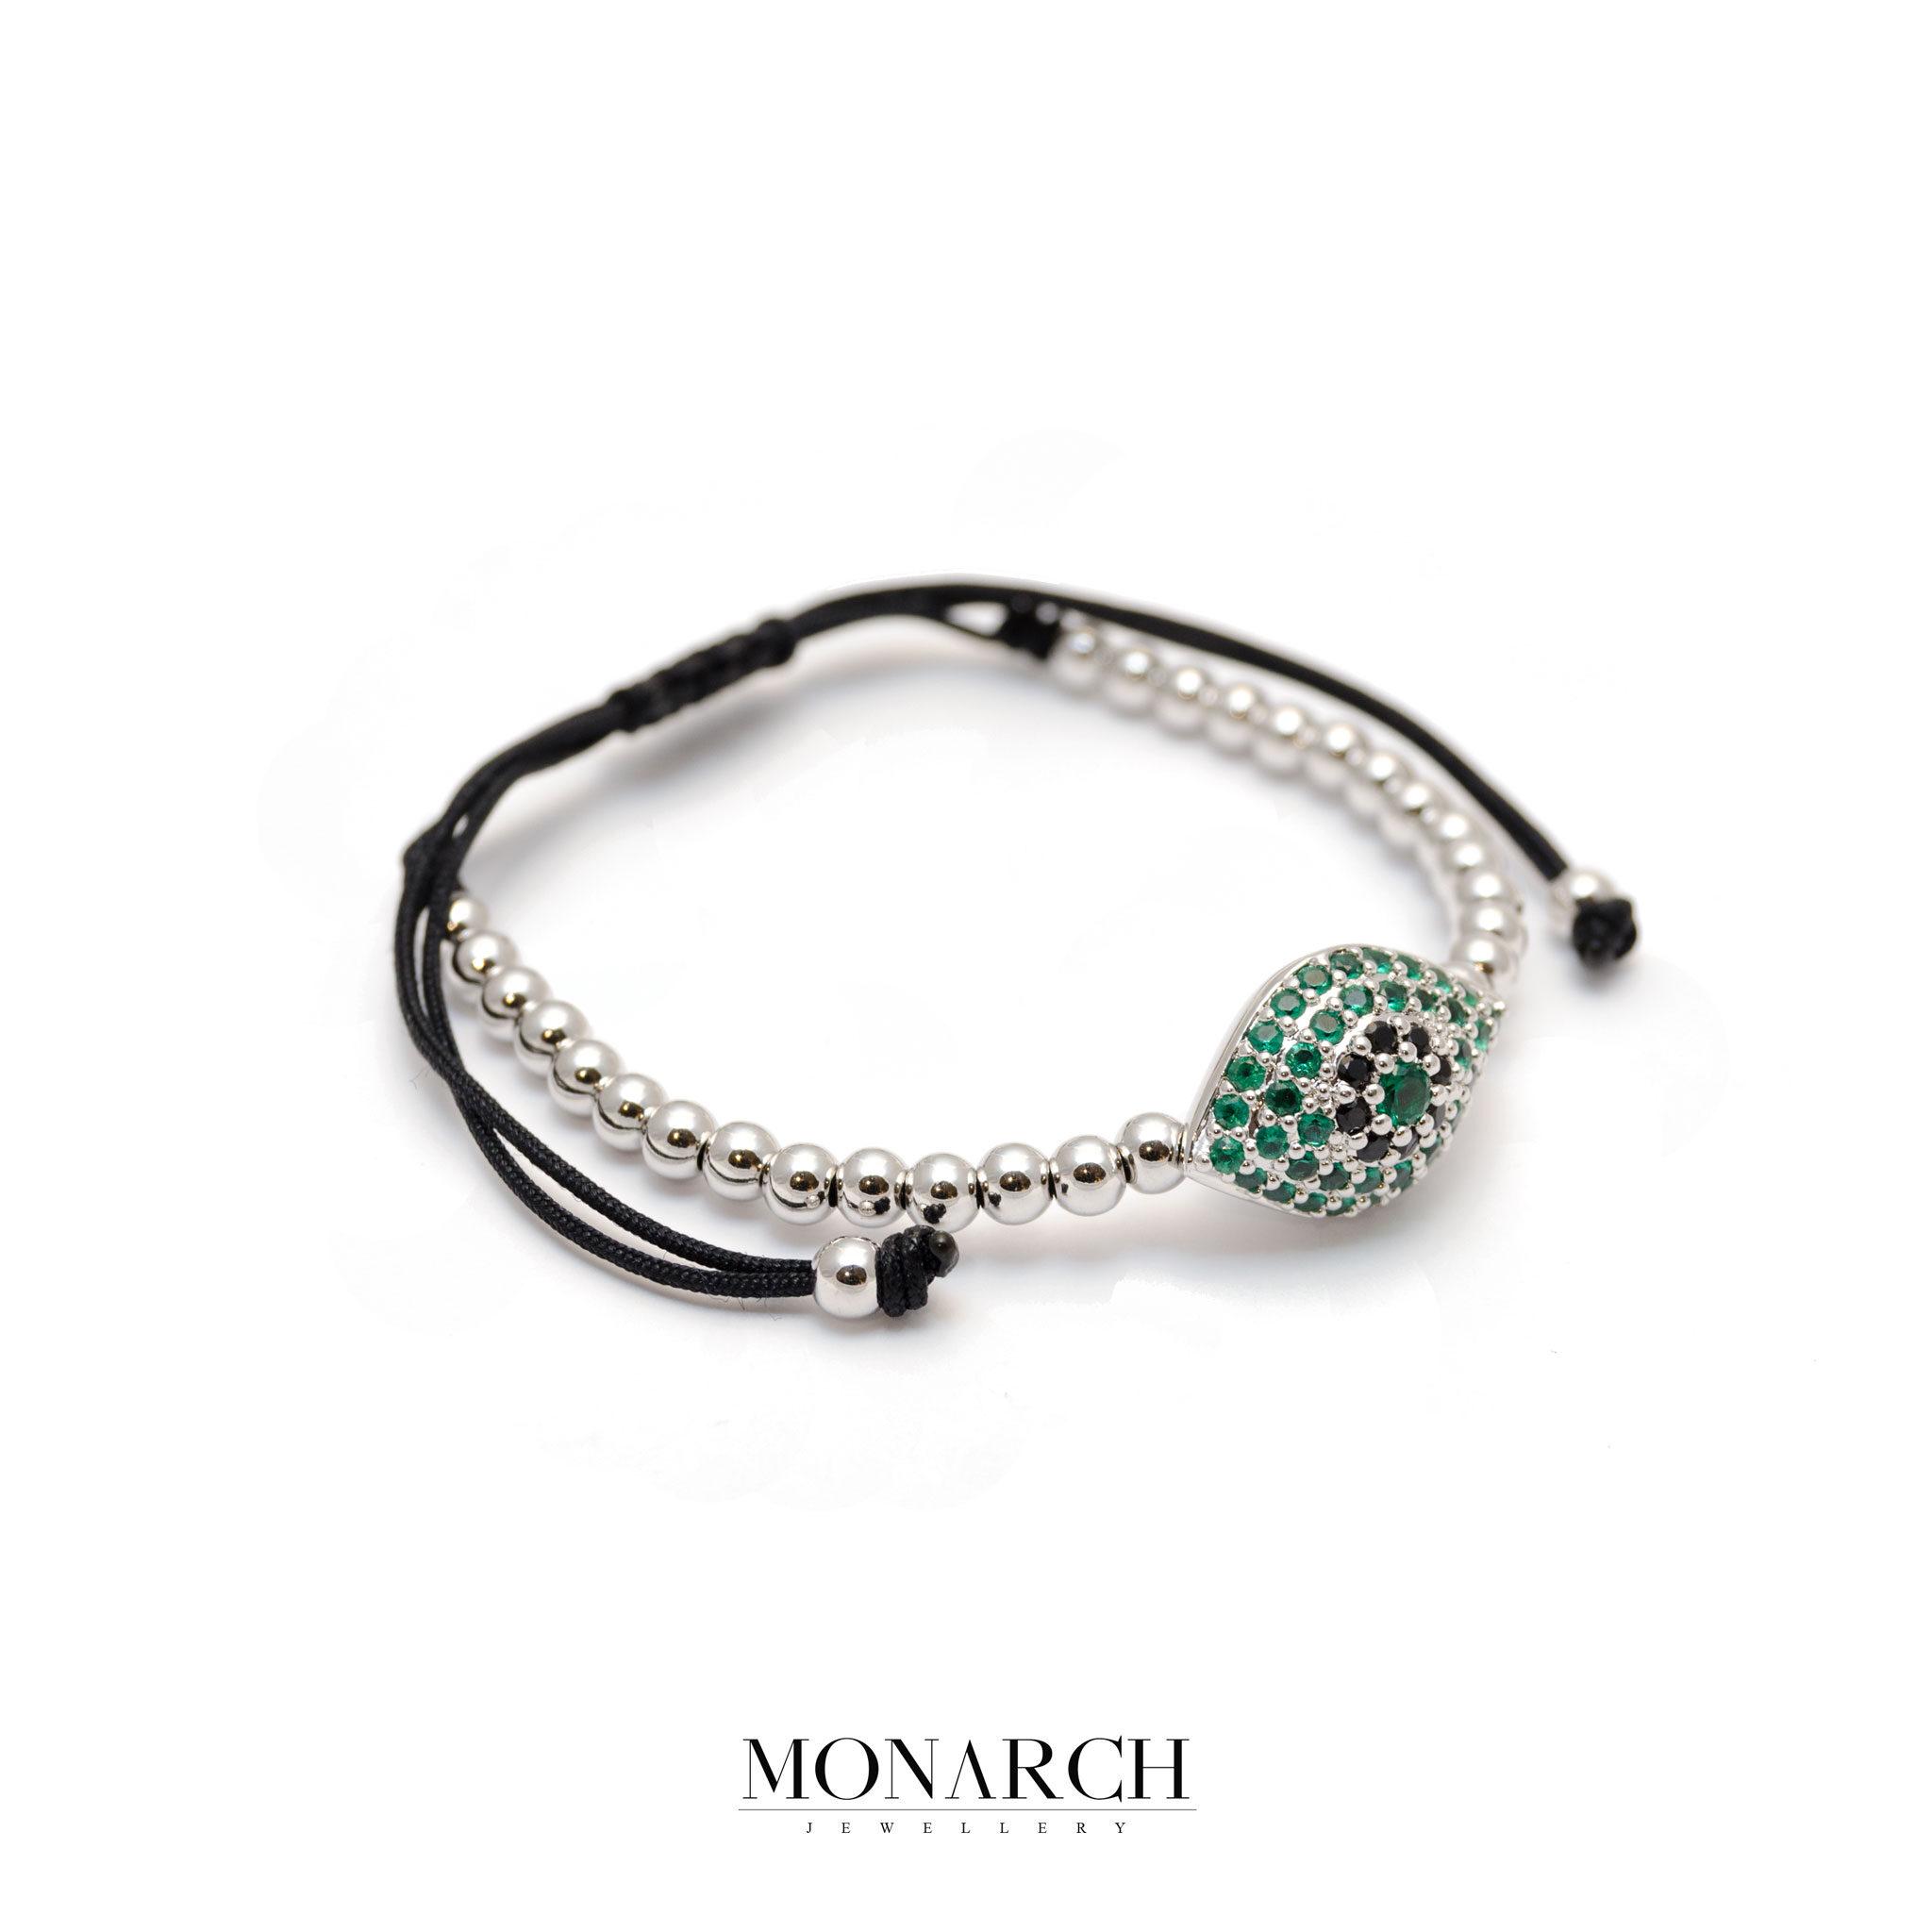 Monarch Jewellery Silver Emerald Evil Eye Charm Macrame Bracelet